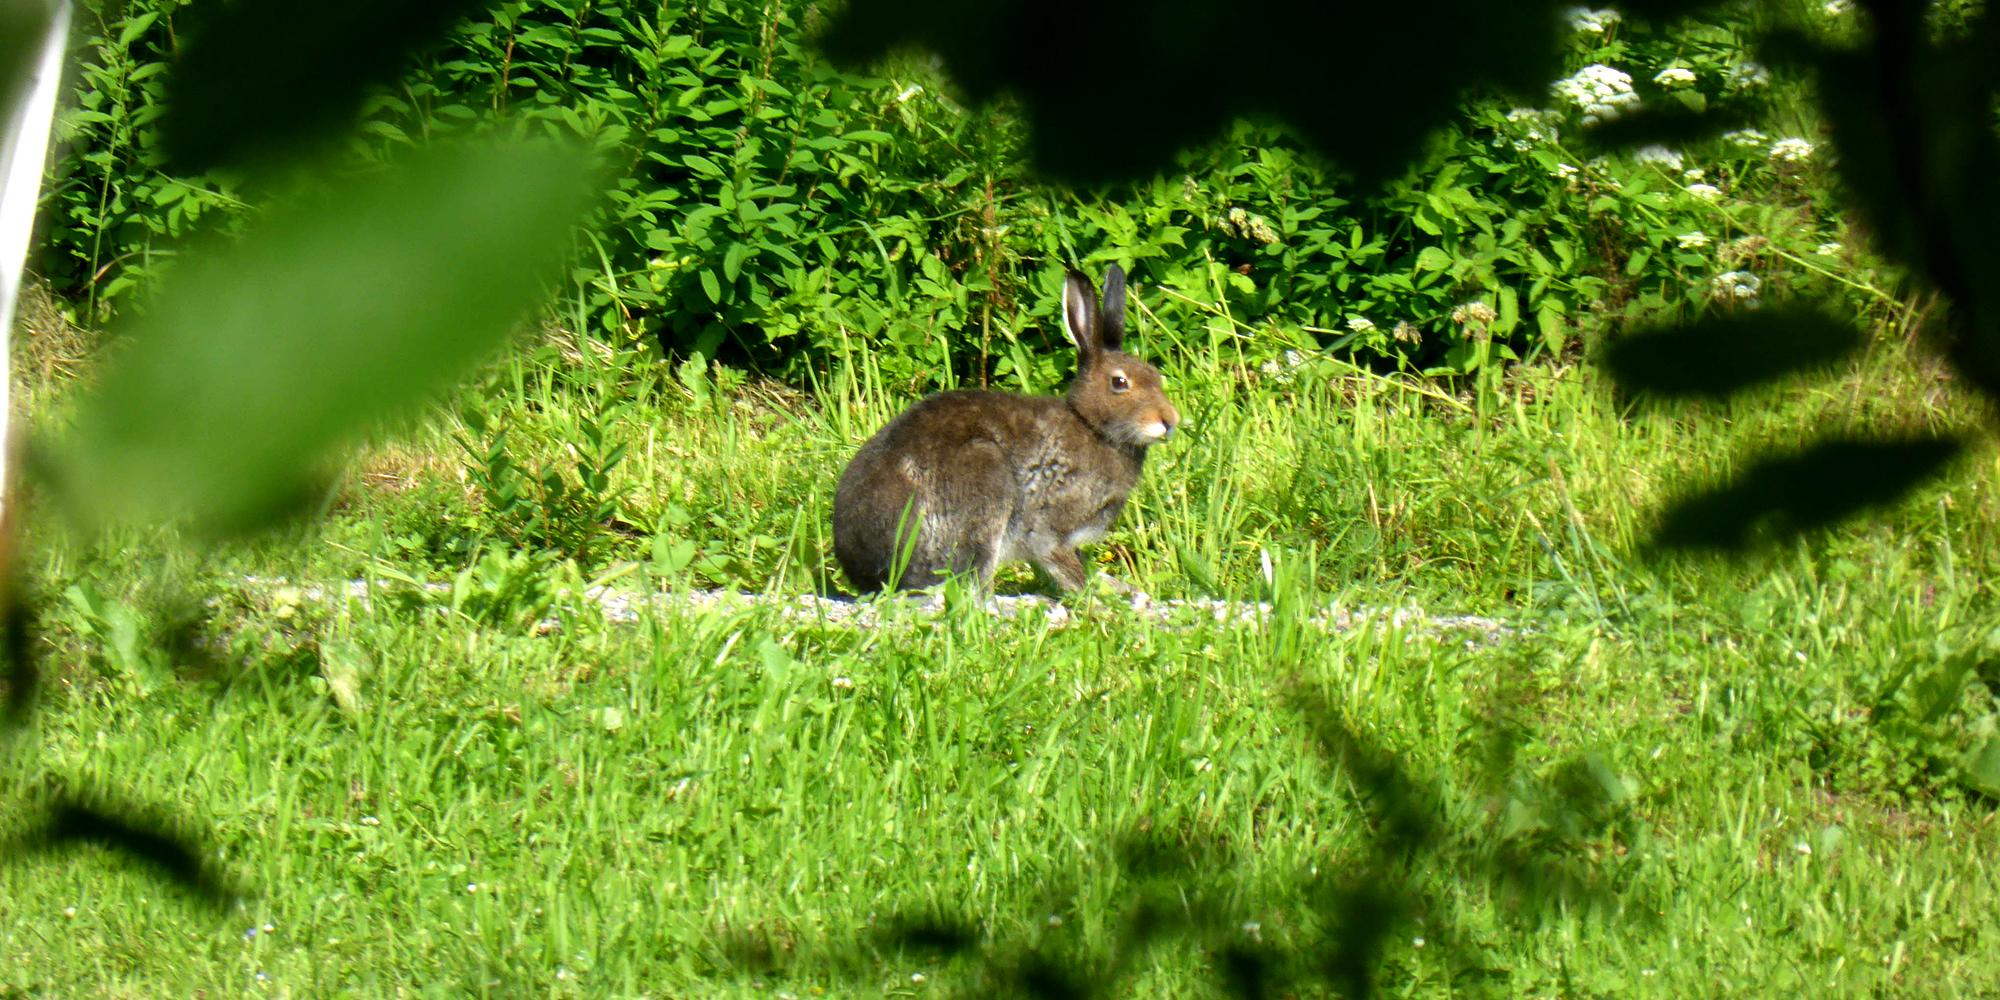 Fargetuva - kanin i hagen. Copyright: Fargetuva